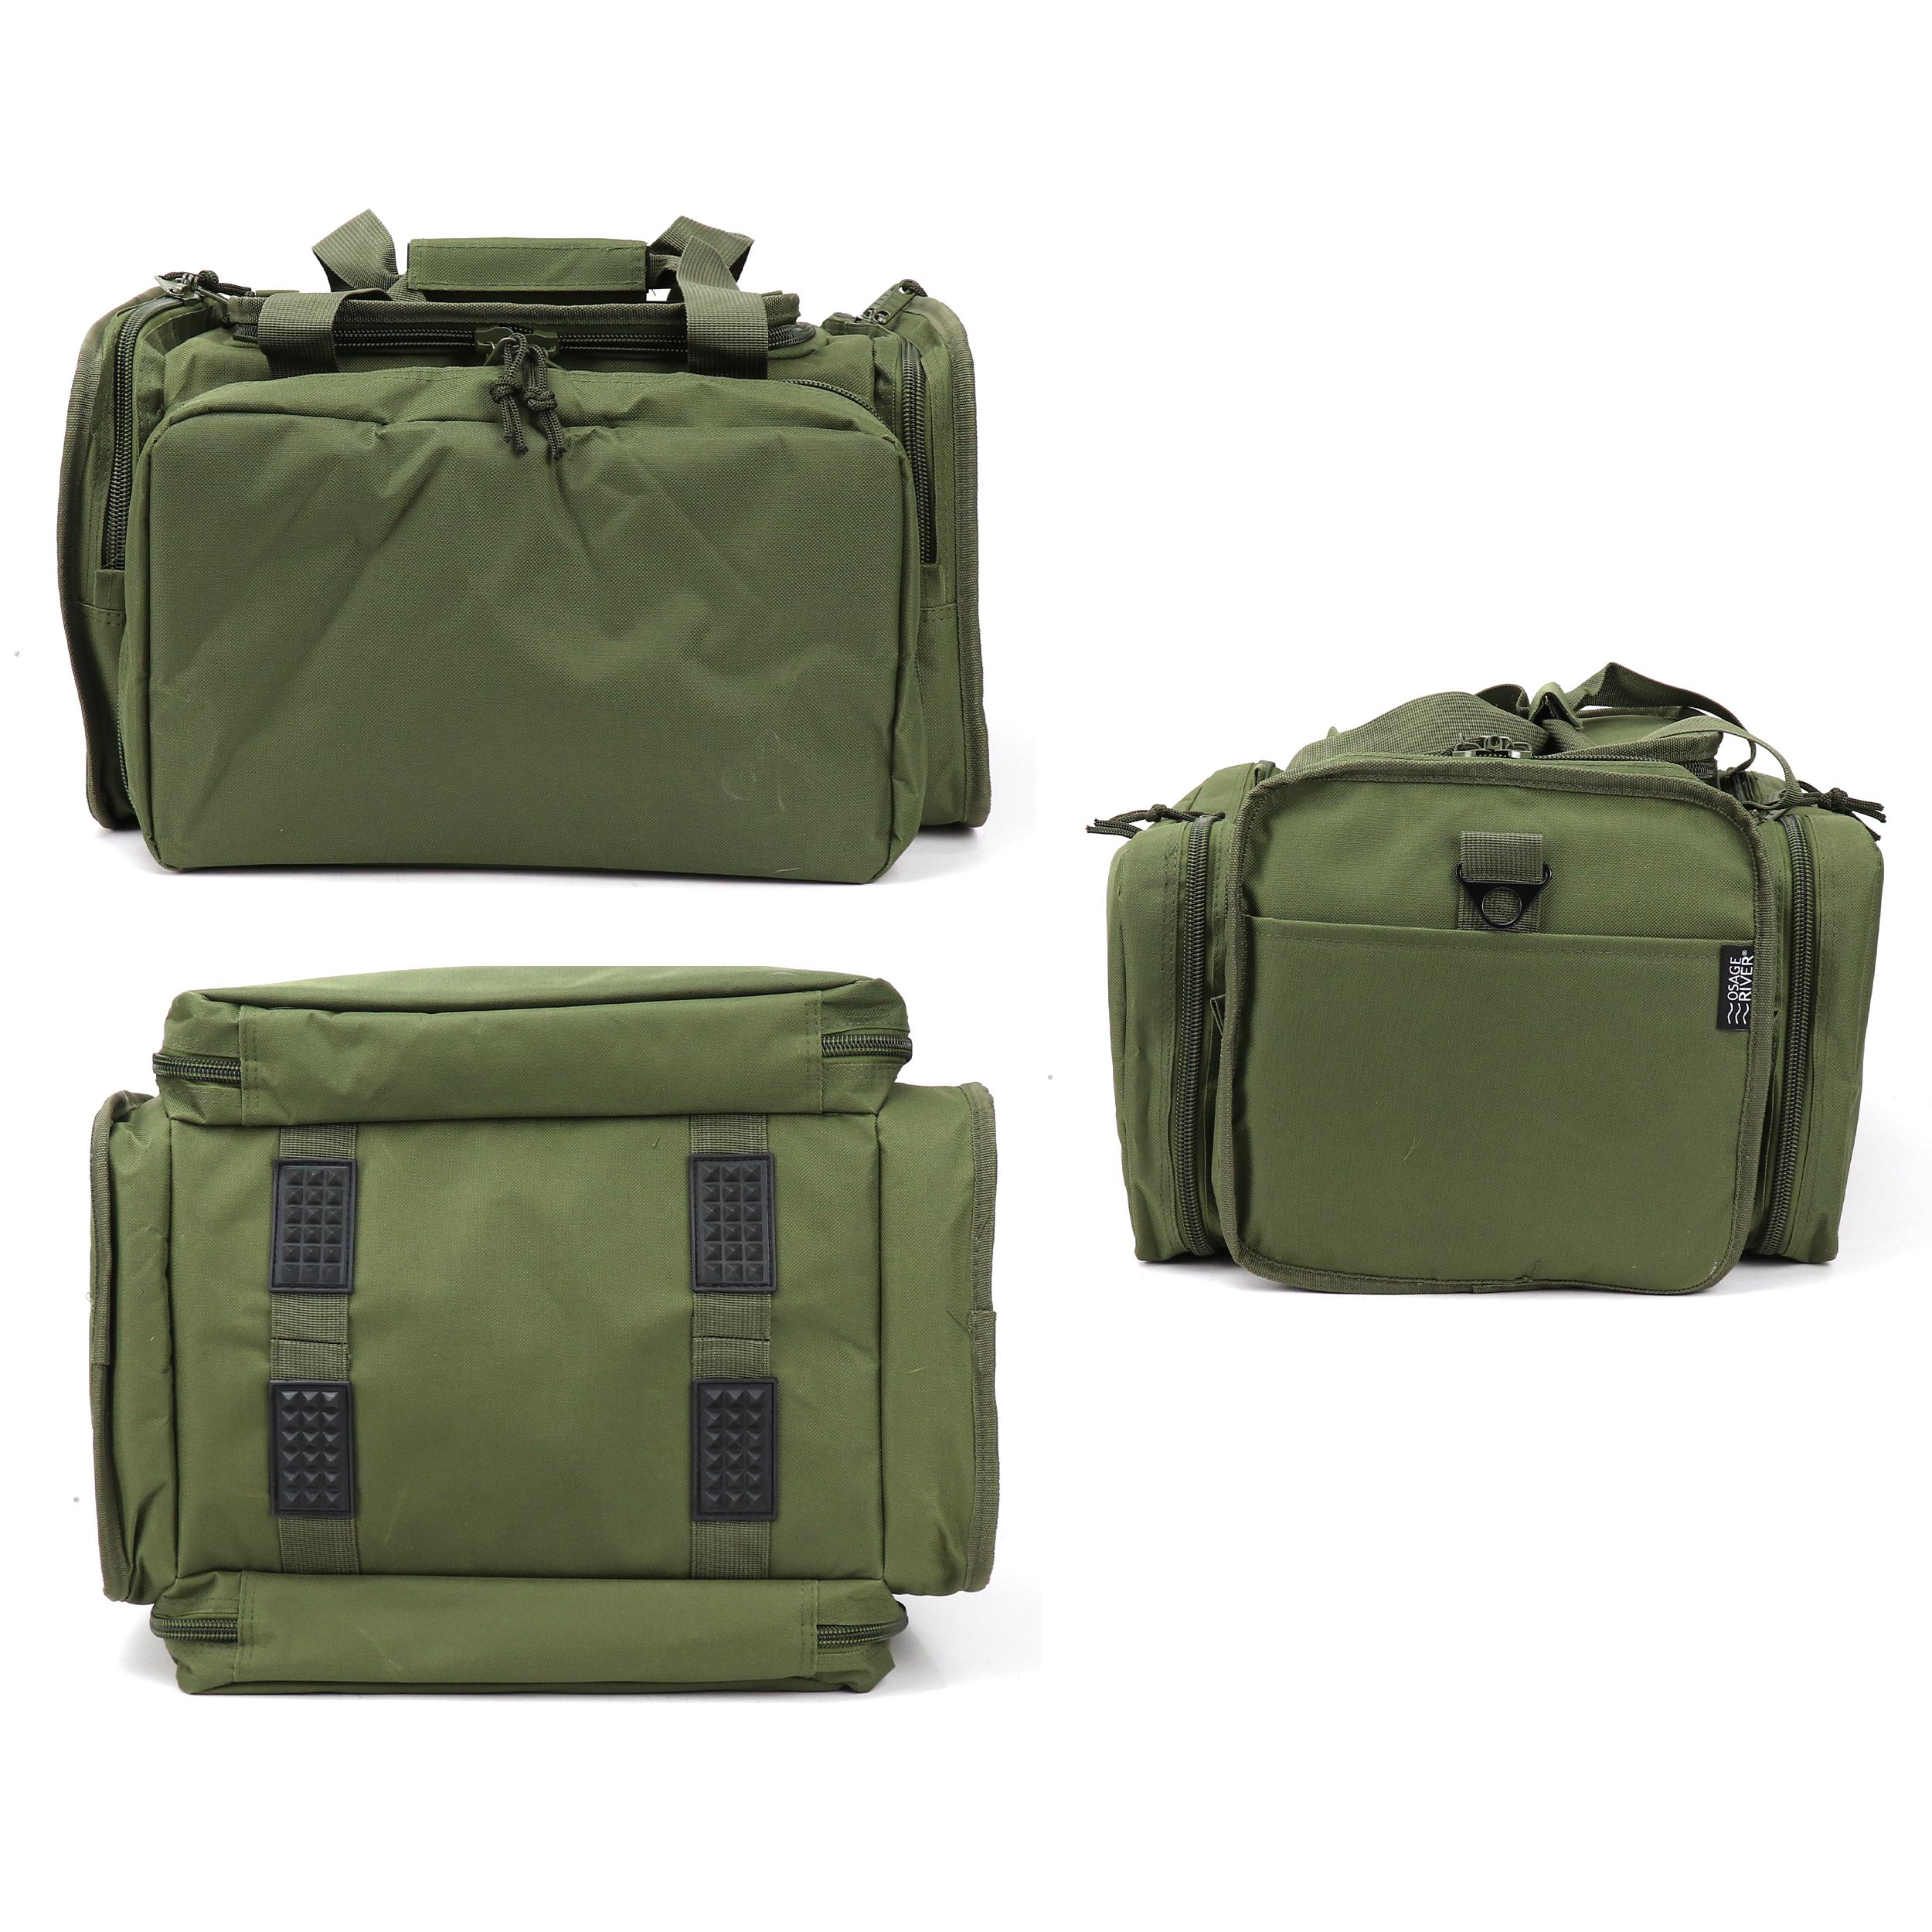 Osage River Tactical Range Bag for Handguns and Hunting Travel Duffel